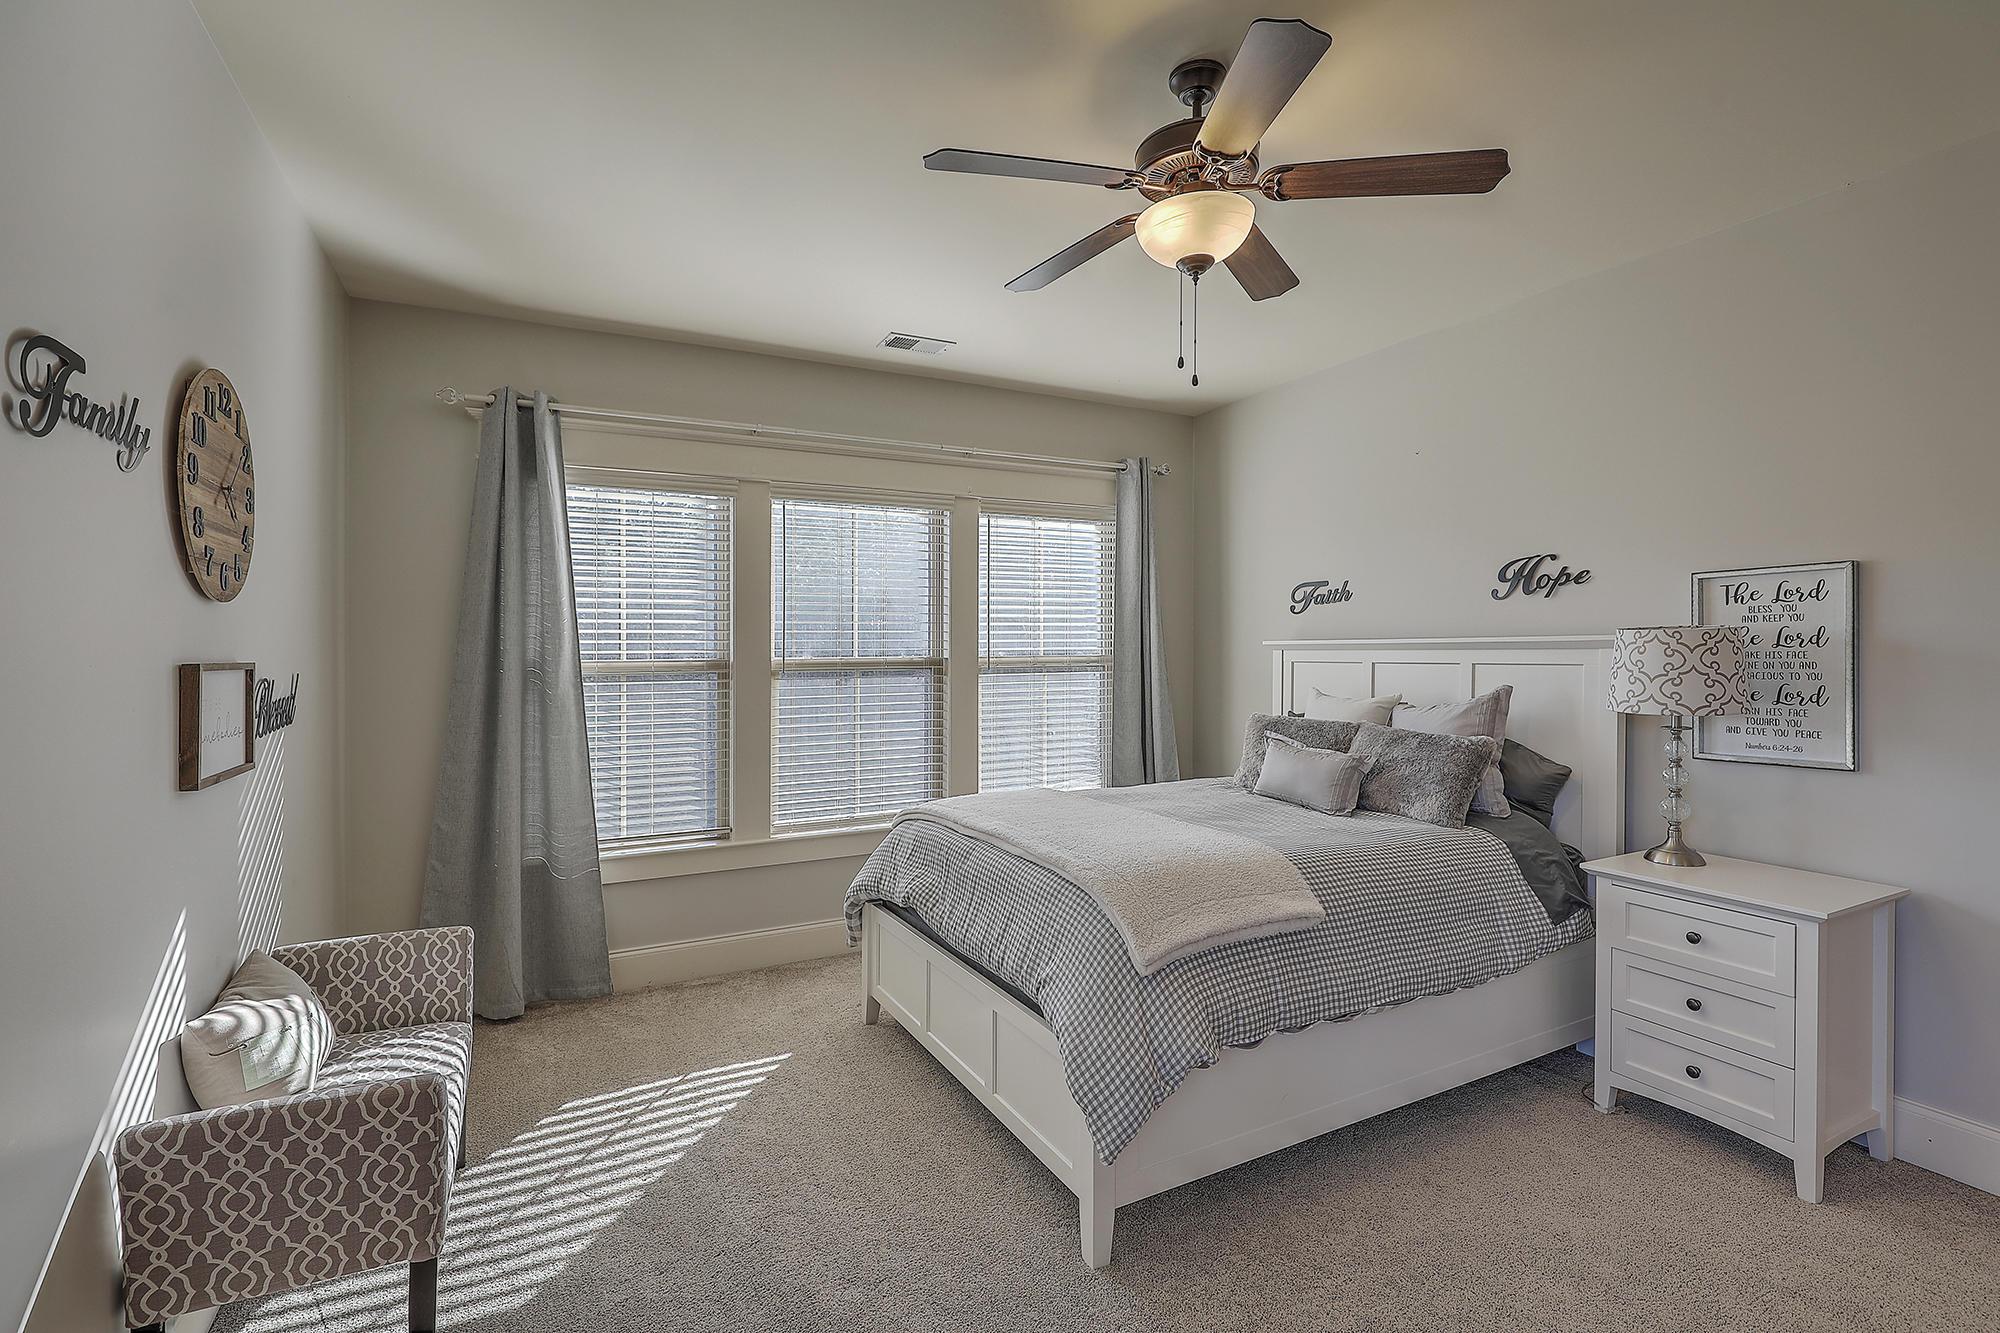 Beresford Creek Landing Homes For Sale - 1170 Rivershore, Charleston, SC - 15